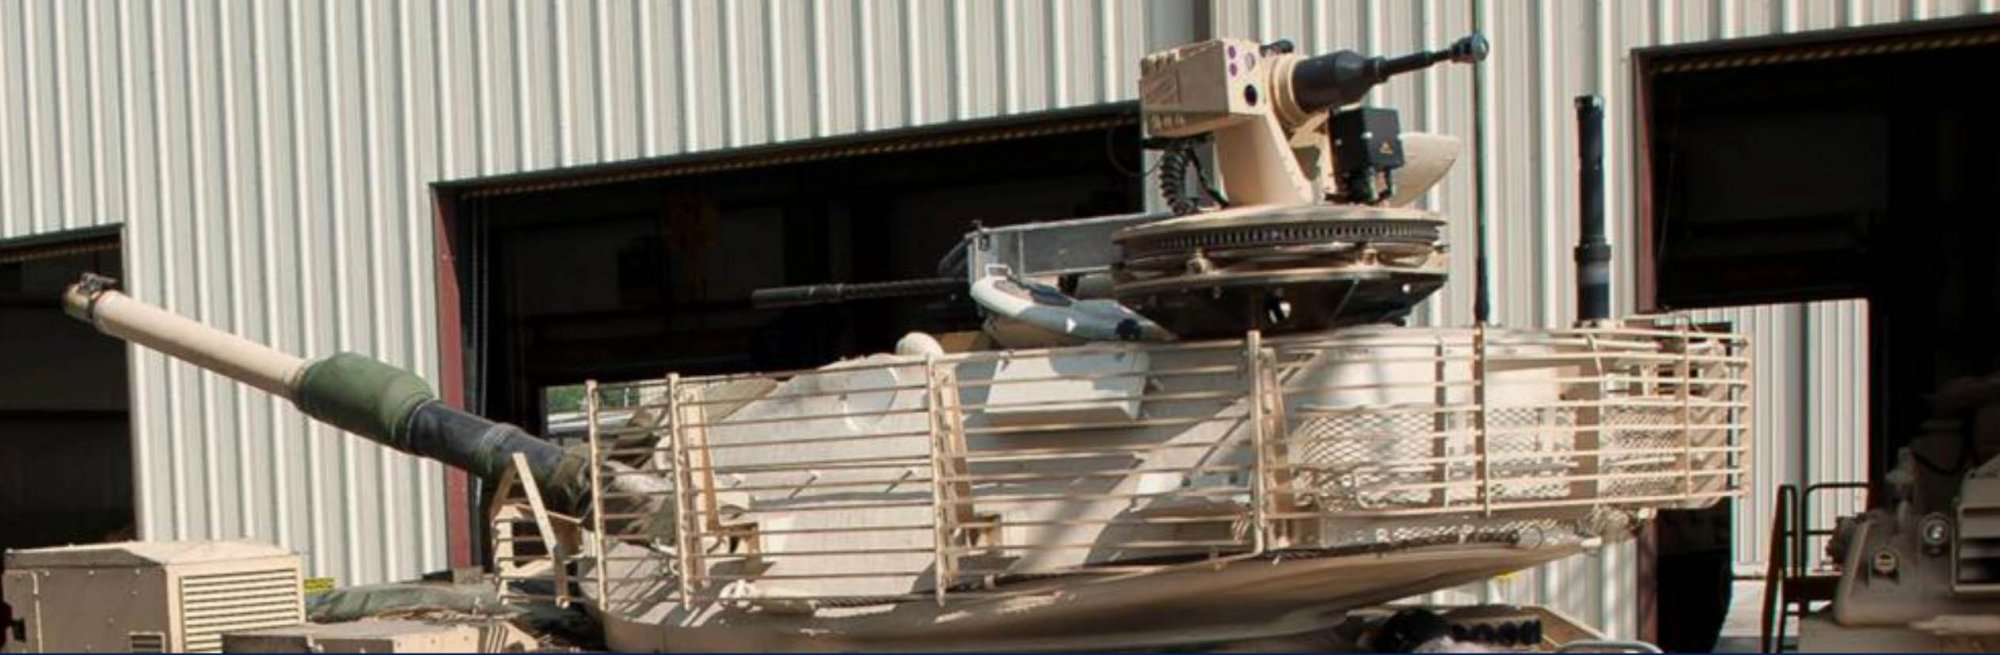 1383019601_m60_tank_modernization-4.jpg